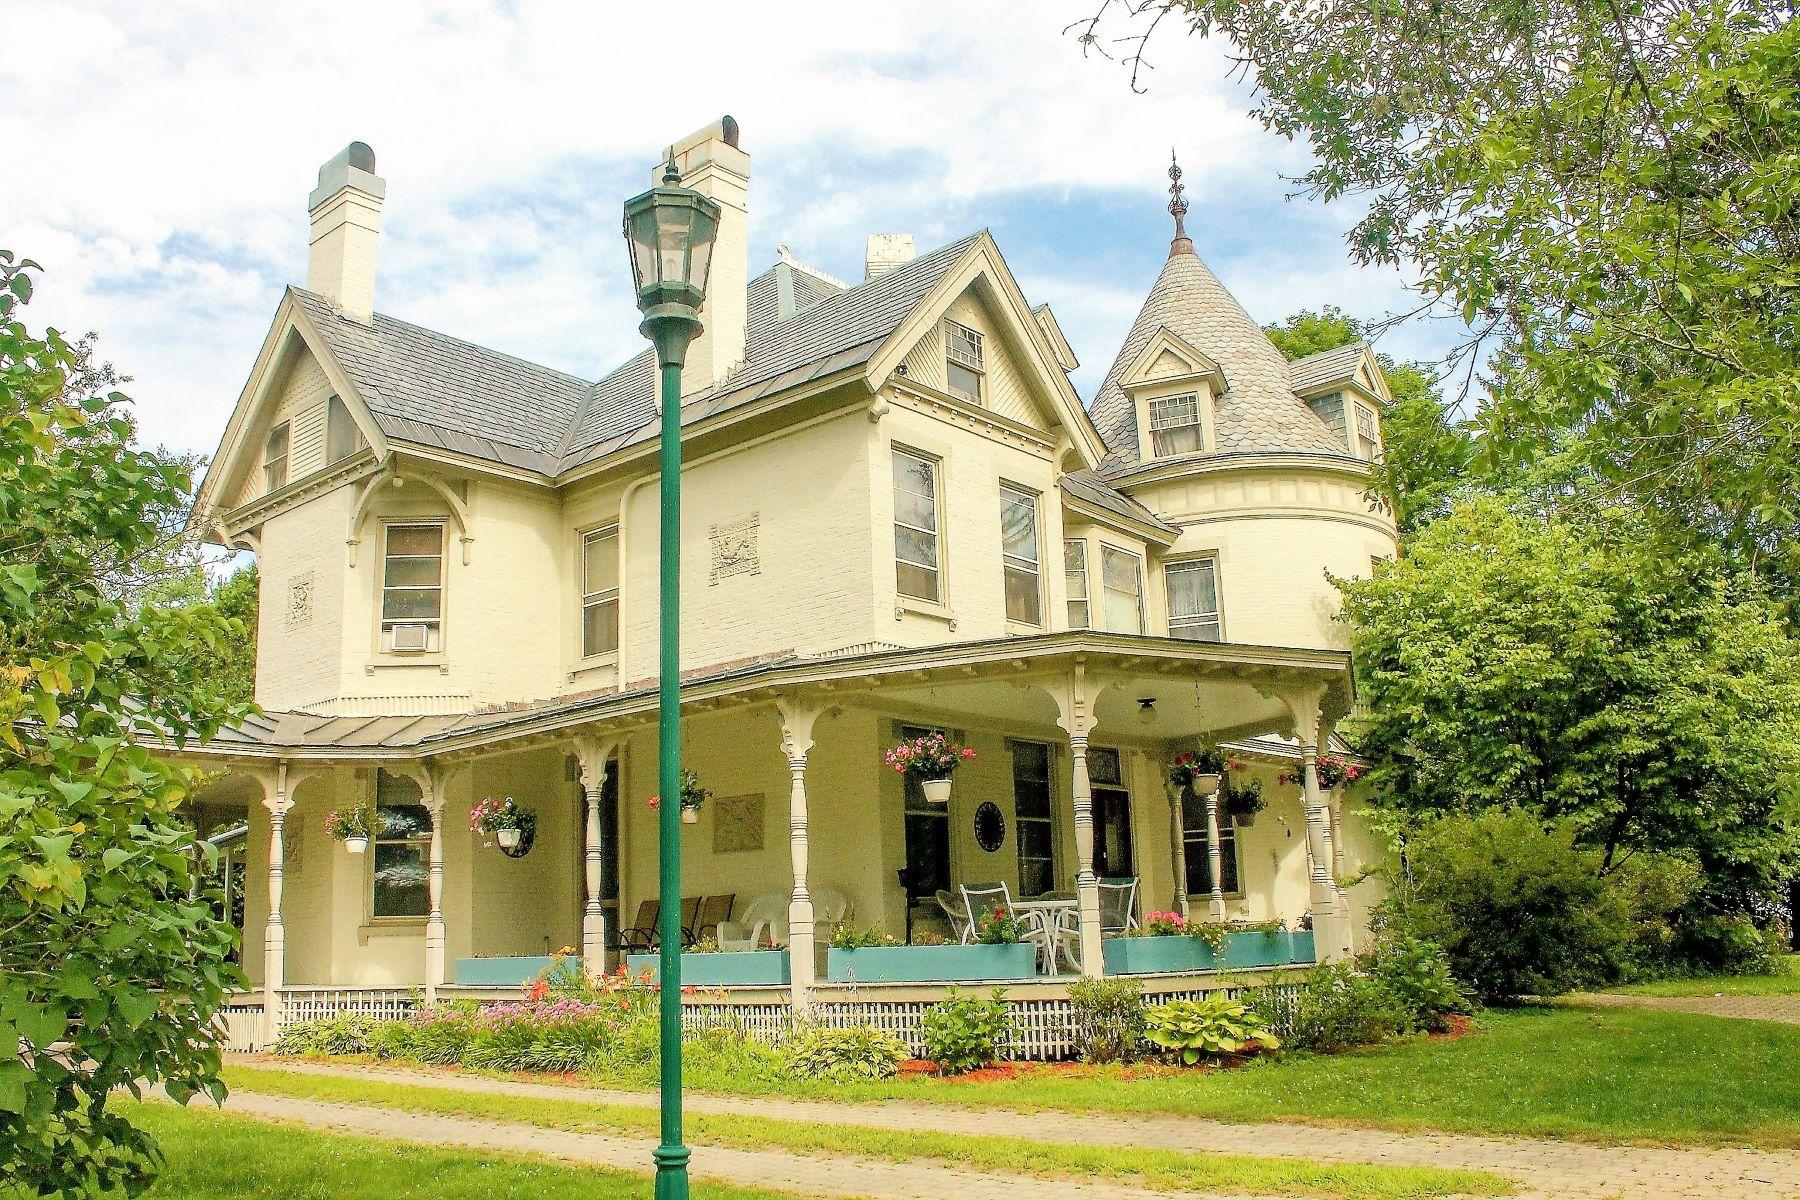 獨棟家庭住宅 為 出售 在 Antique, historic home in Randolph 41 South Main St Randolph, 佛蒙特州, 05060 美國